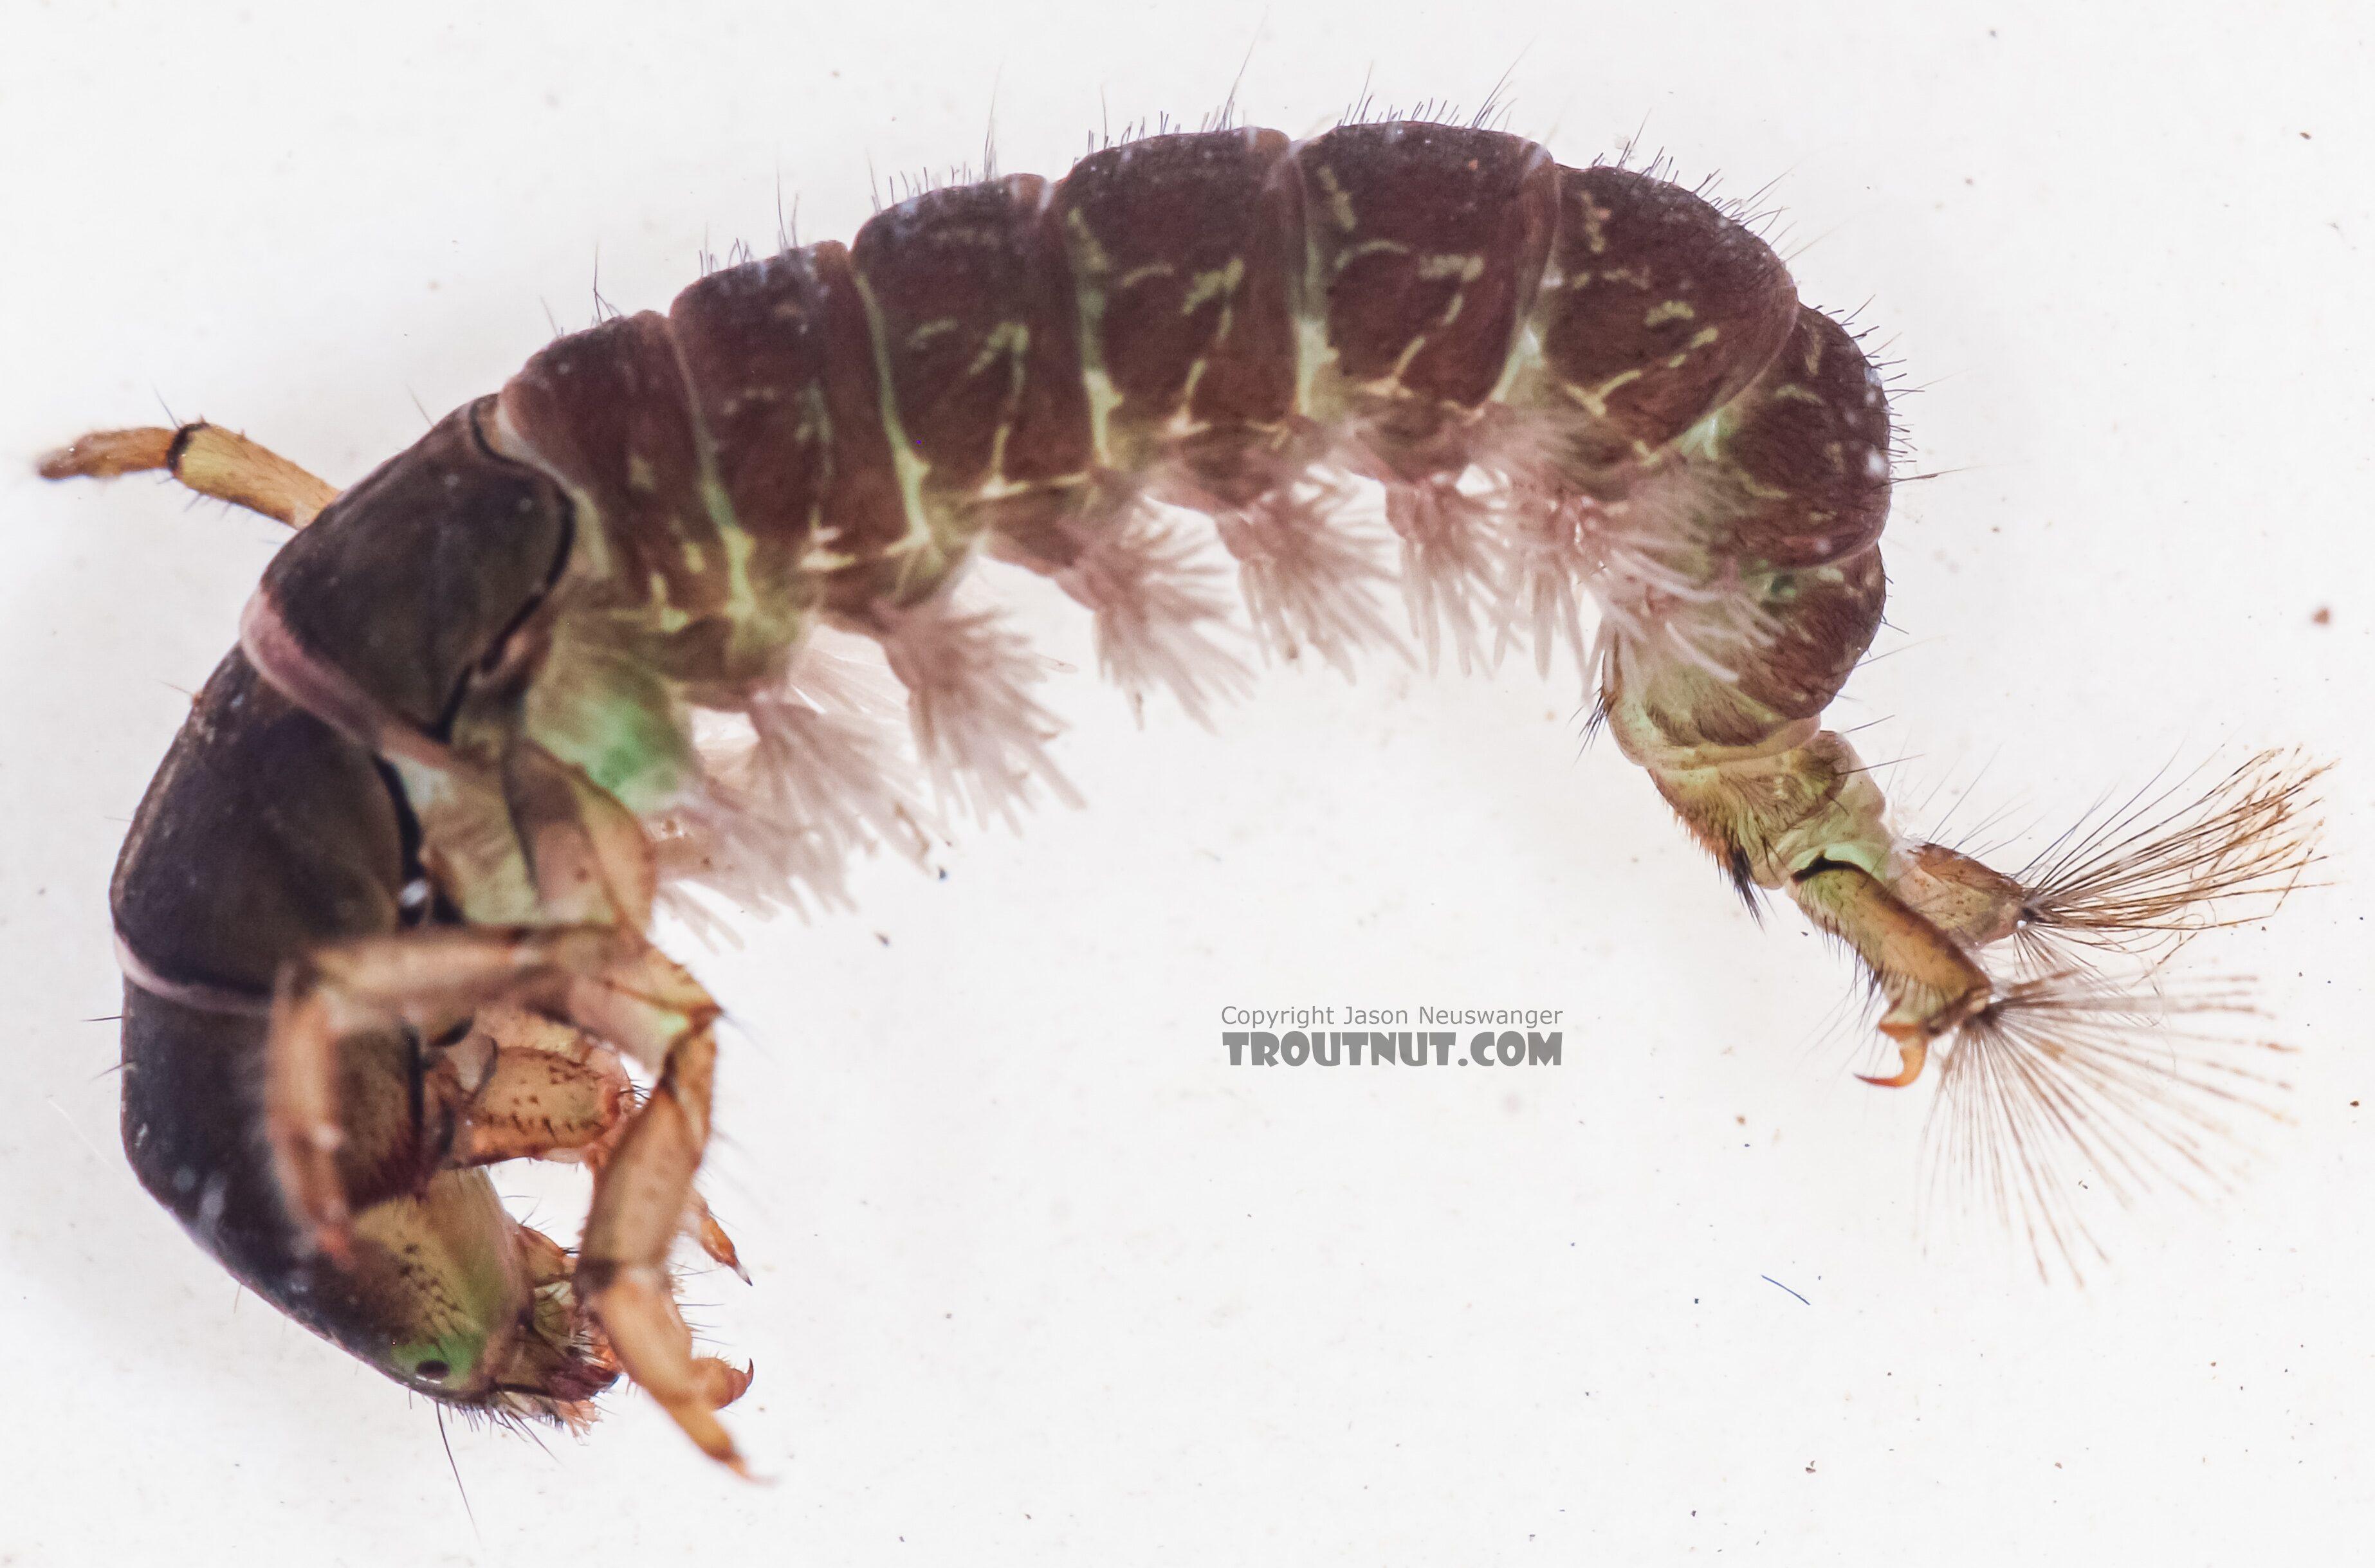 Hydropsychidae Caddisfly Larva from the East Fork Big Lost River in Idaho